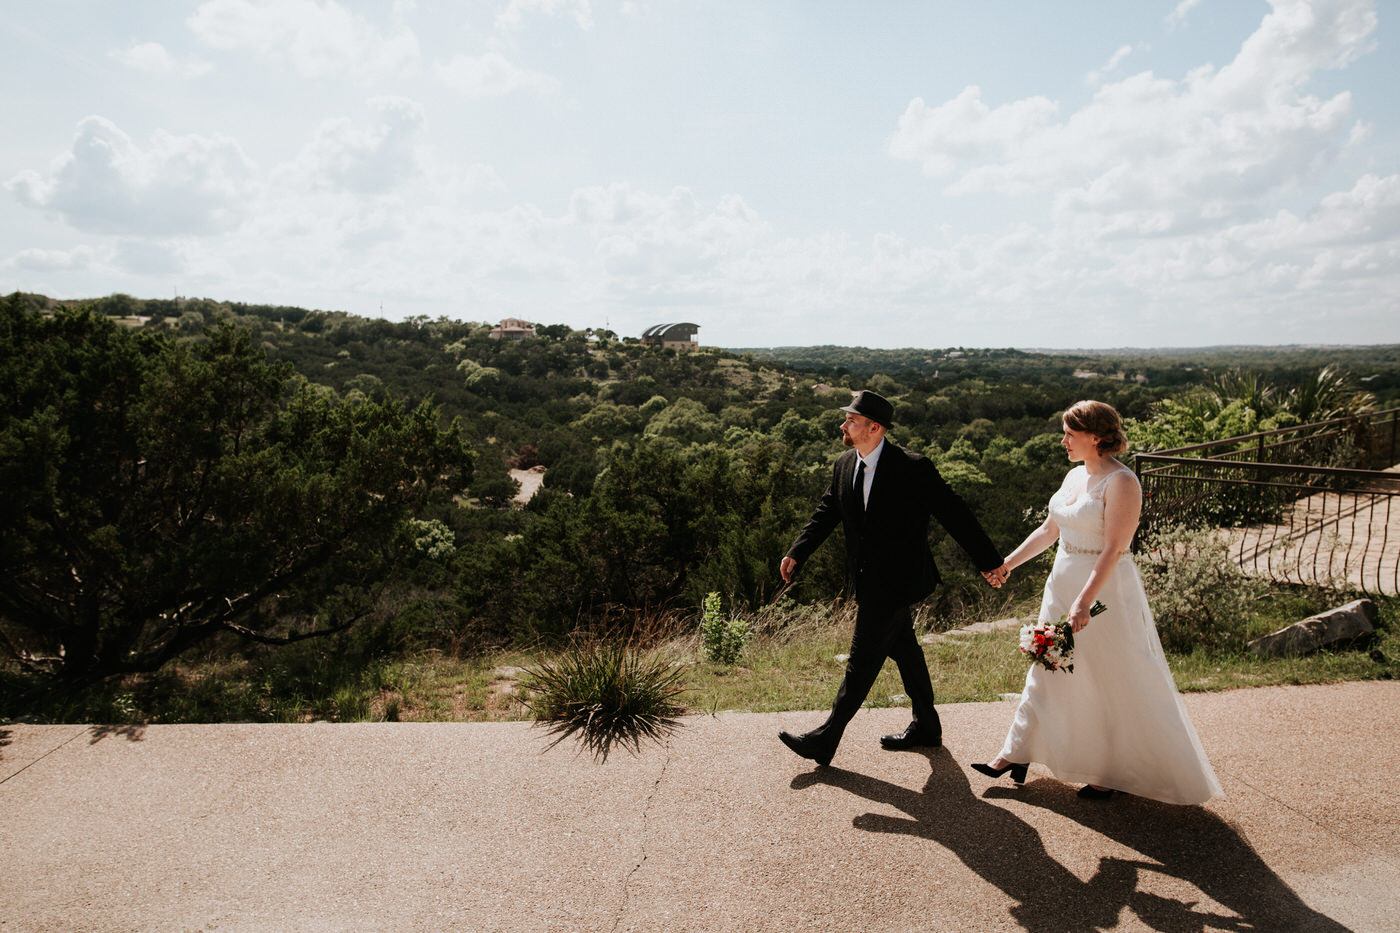 Chapel Dulcinea Elopement Wedding - Diana Ascarrunz Photography-251.jpg